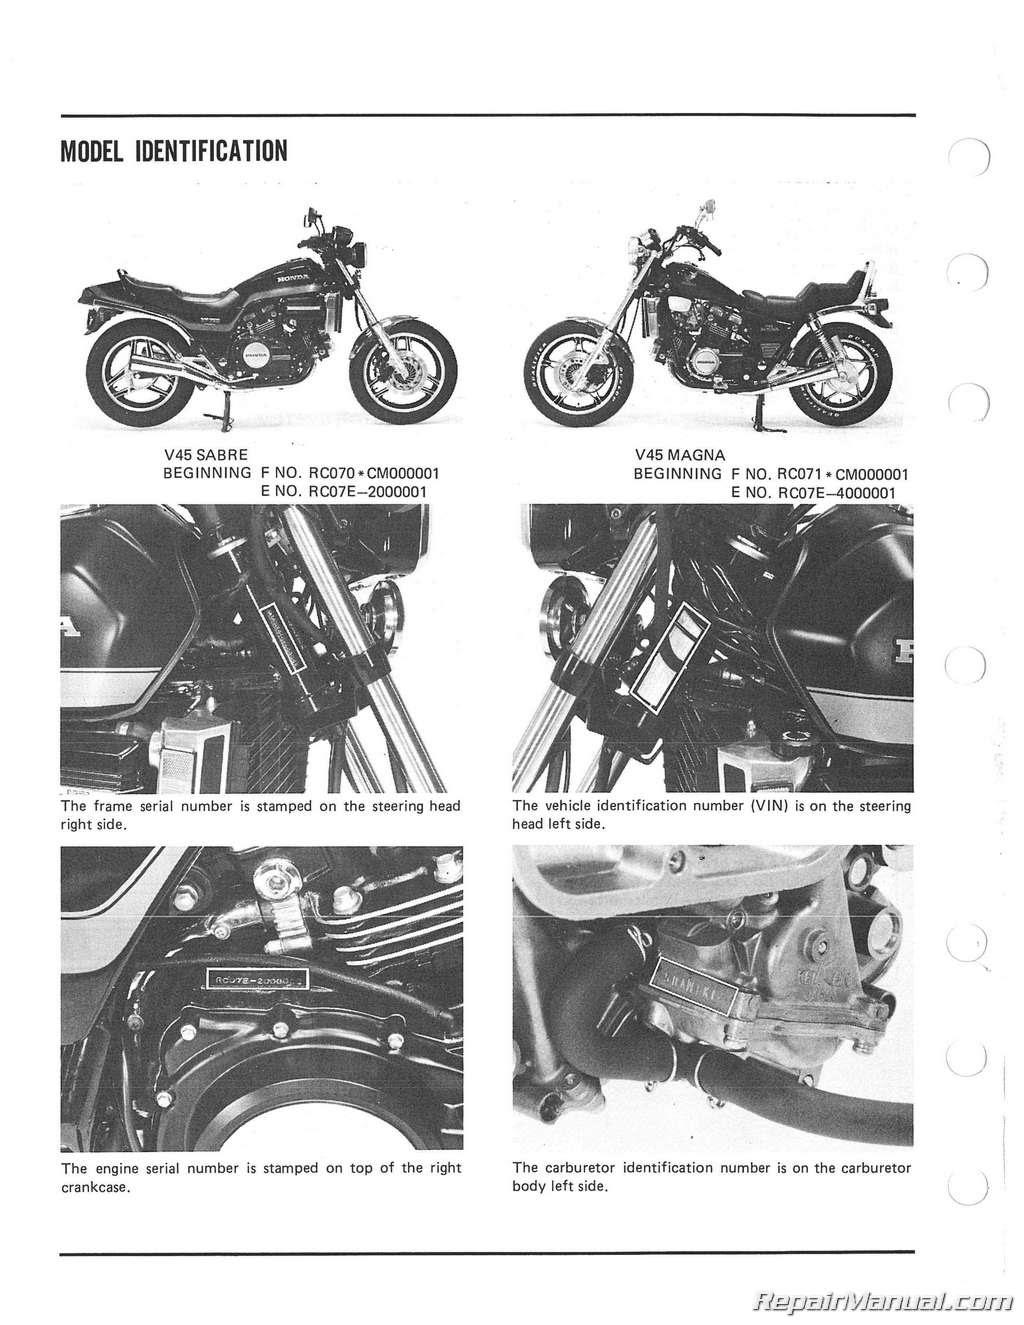 1982 - 1985 Honda VF700C Magna, VF750S V45 Sabre ...